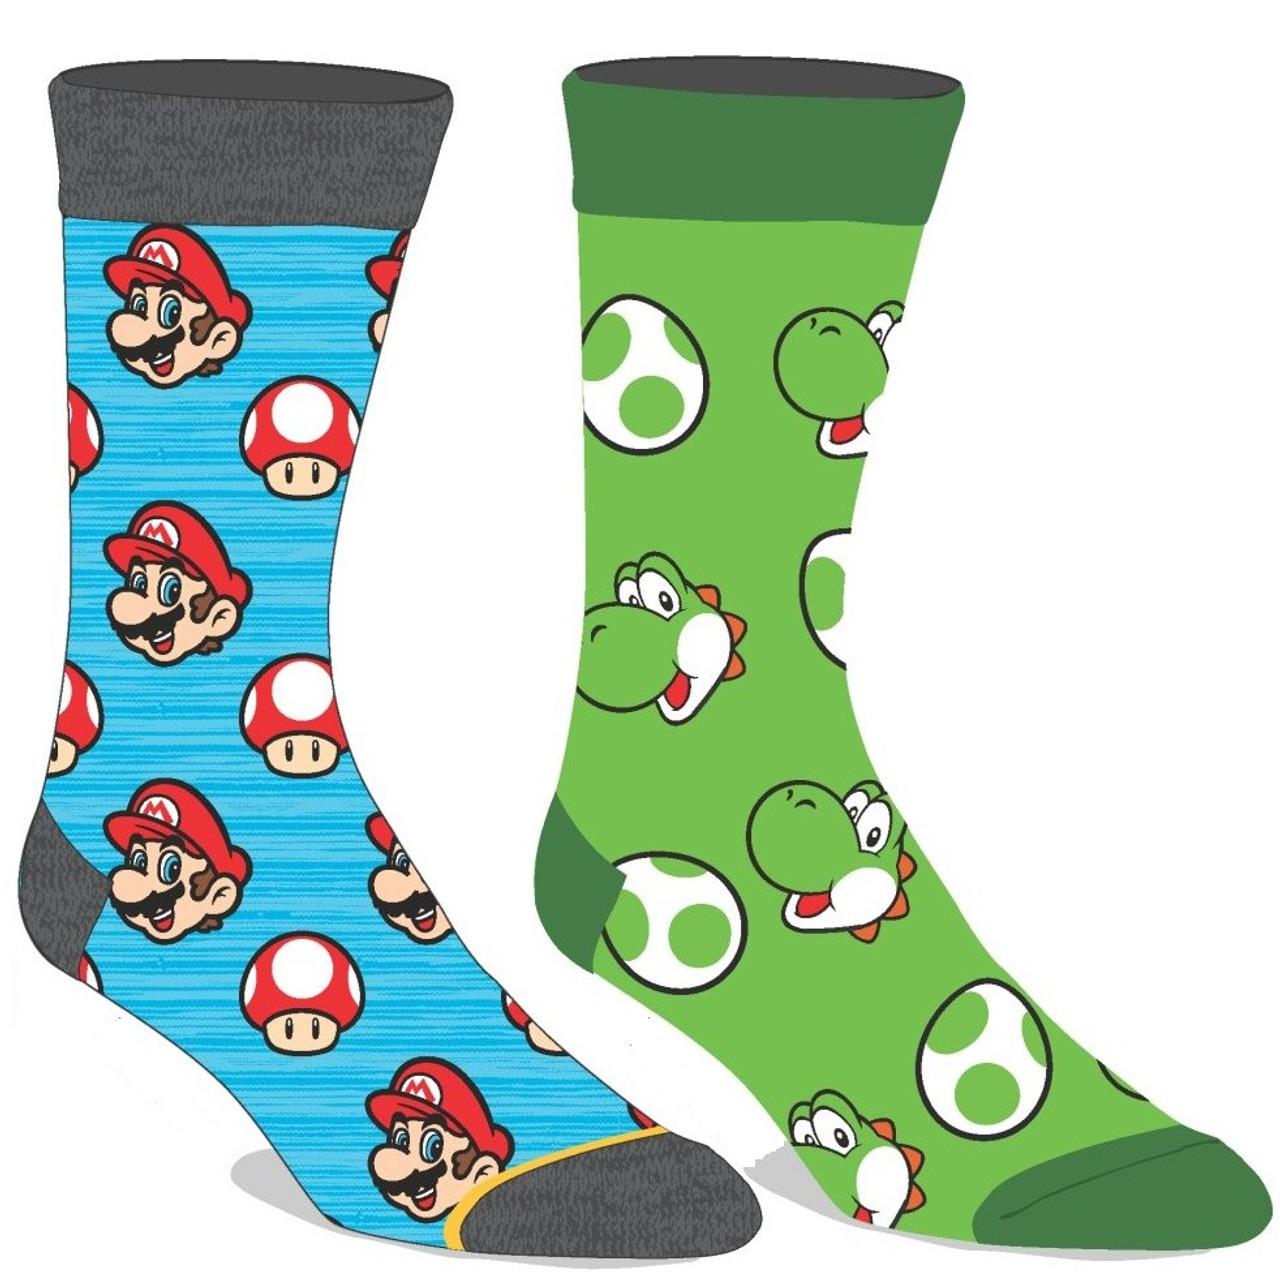 Super Mario Christmas Stocking.Two Pairs Of Super Mario Bros Yoshi And Mario Crew Socks By Bioworld